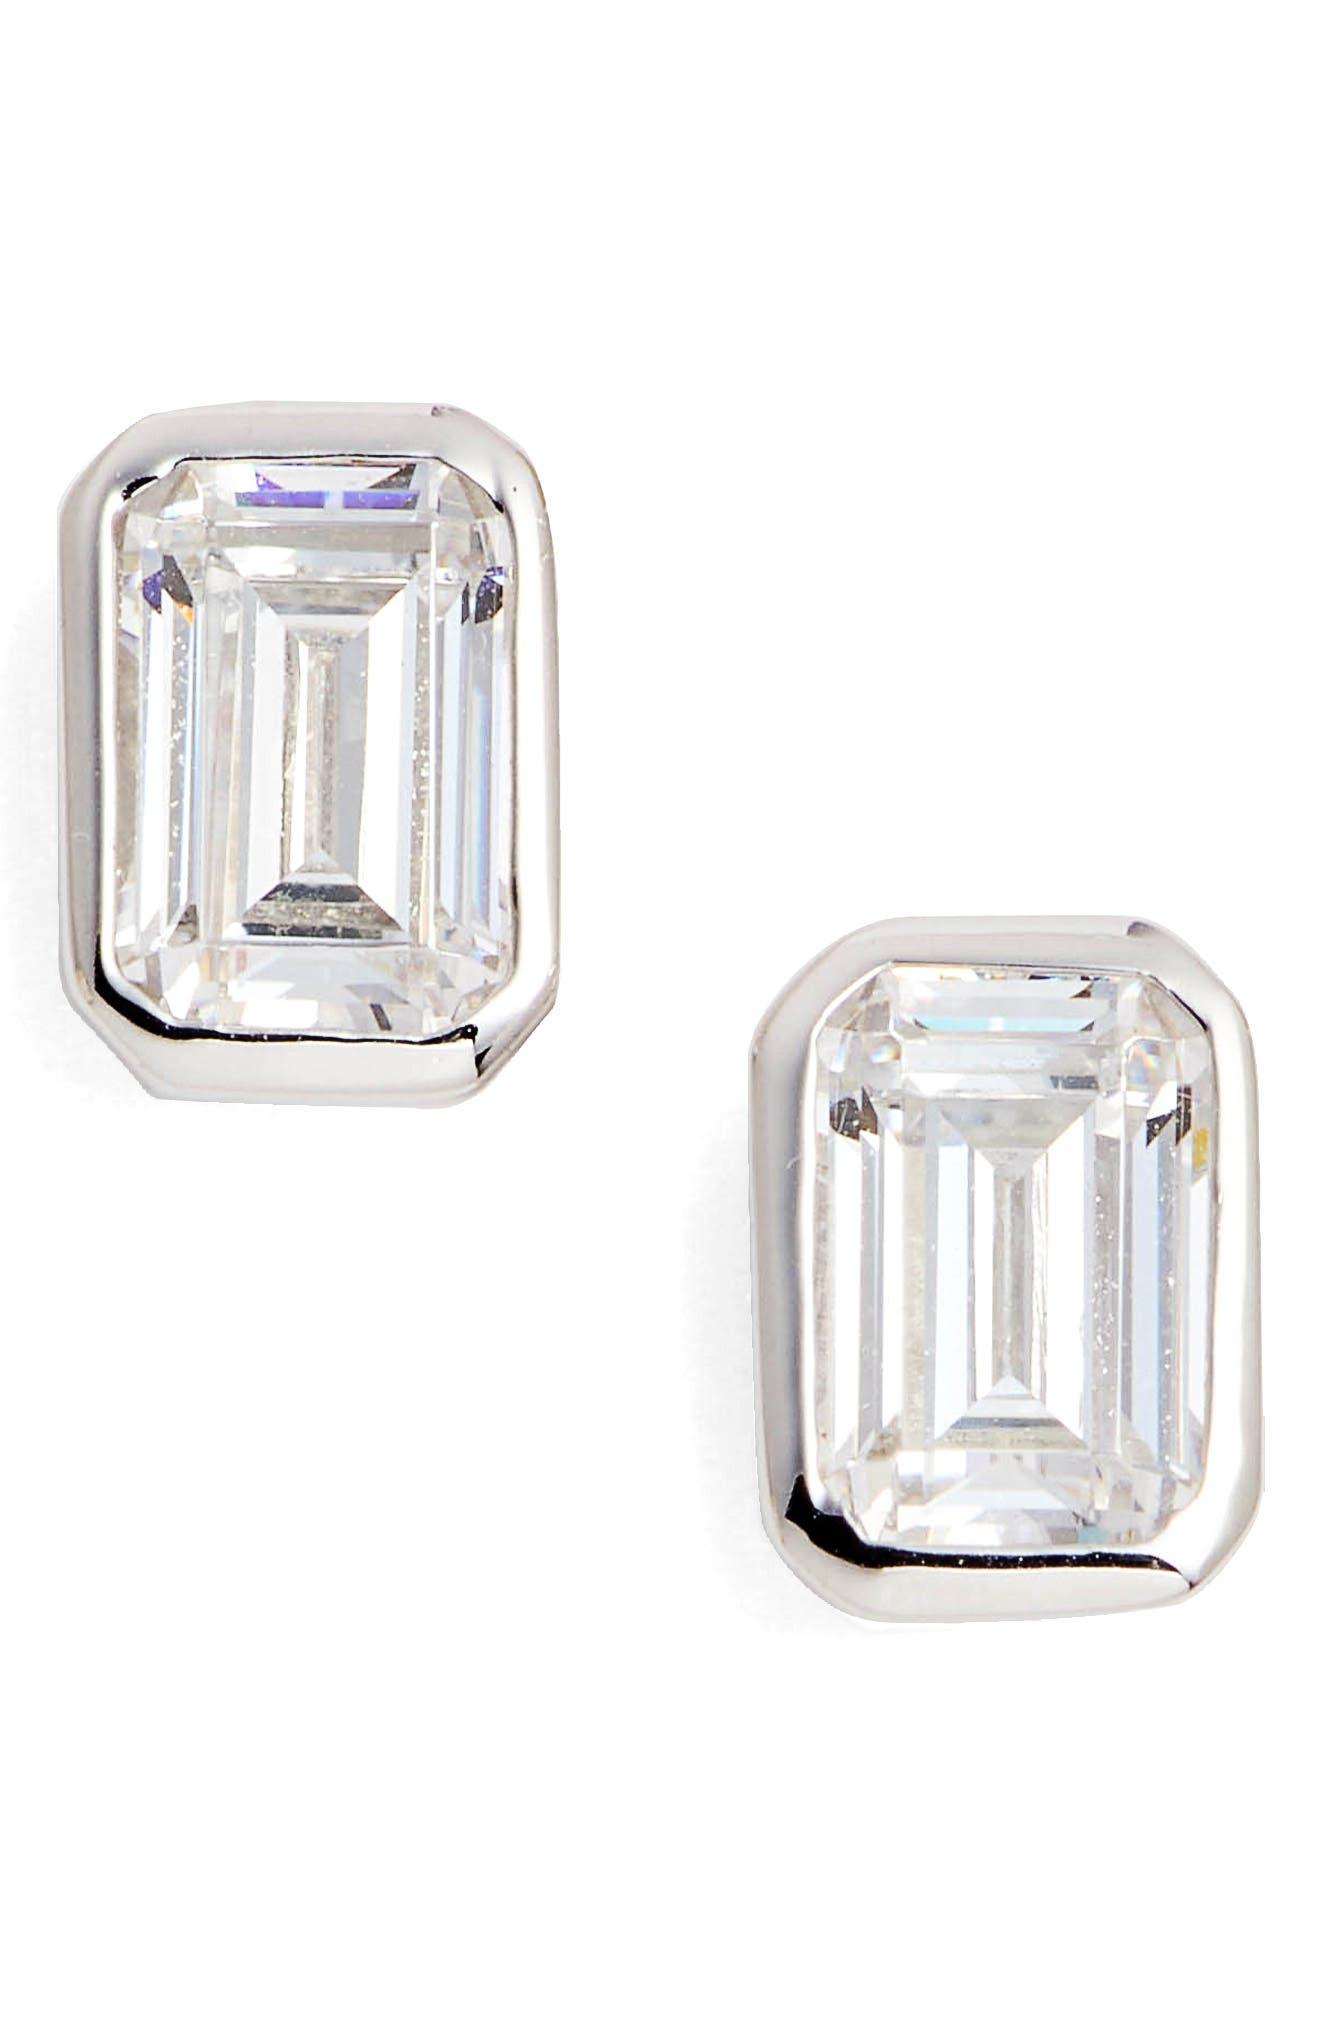 Bezel-Set Emerald Cut Stud Earrings,                             Main thumbnail 1, color,                             040